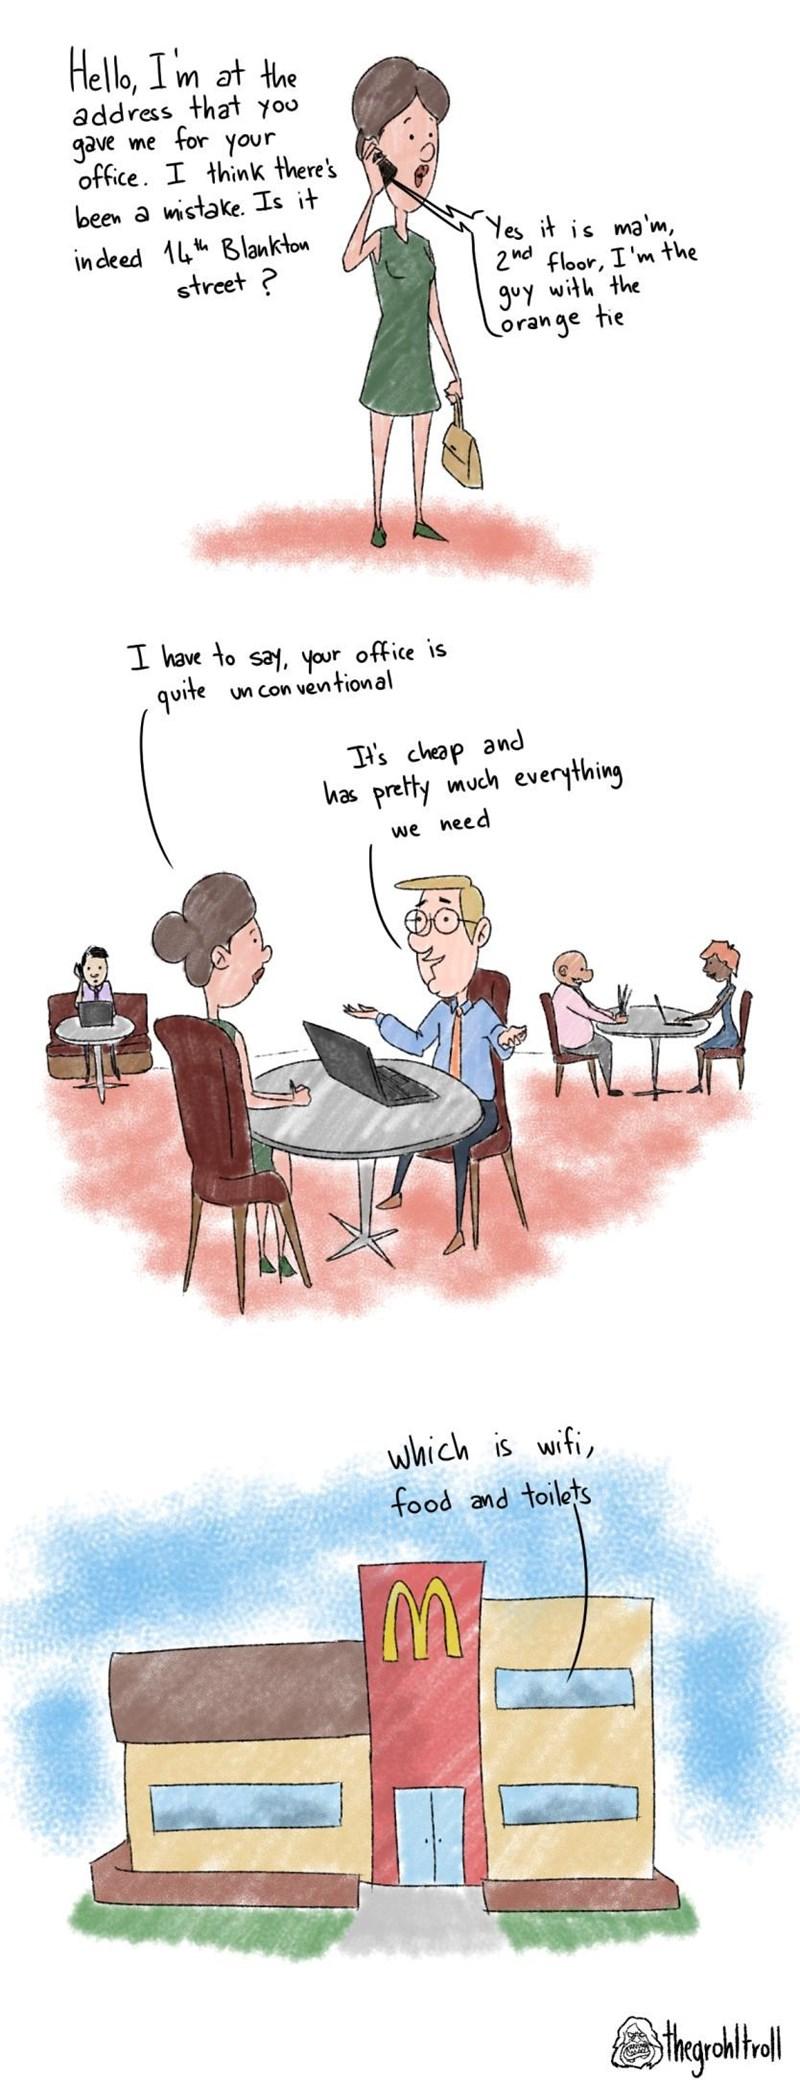 web-comics-mcdonalds-cheap-convenient-office-space-real-talk